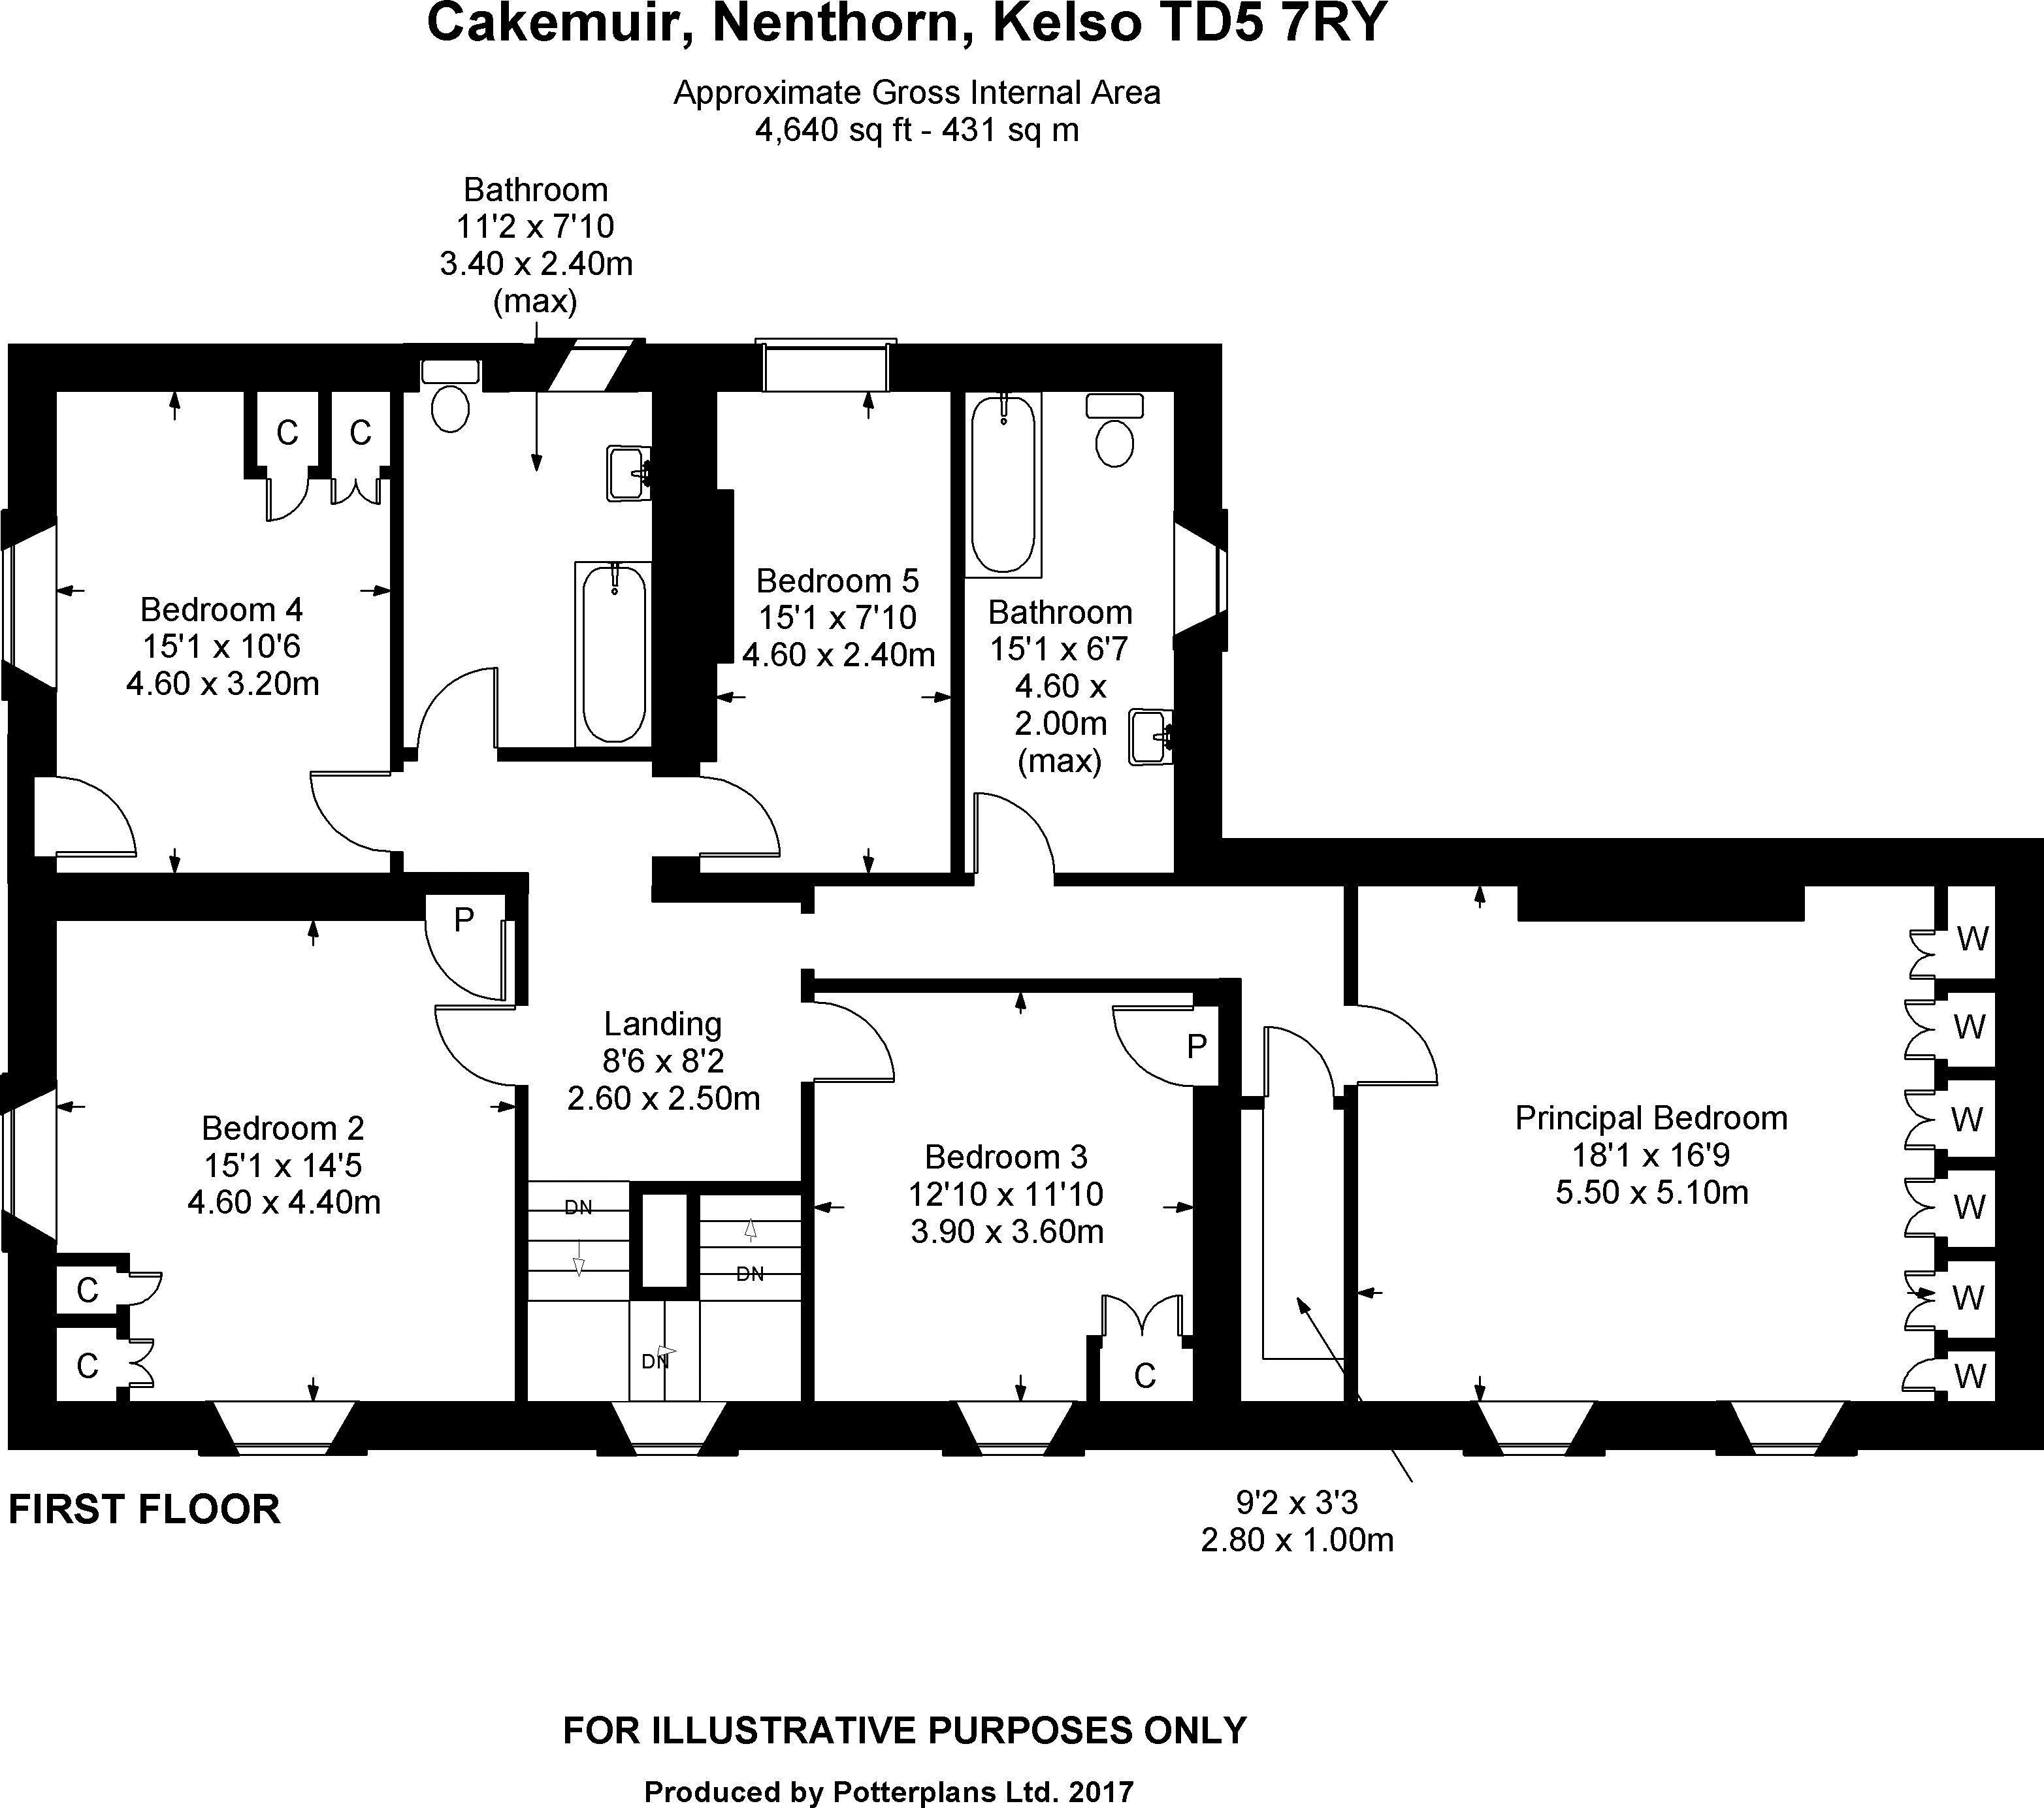 Cakemuir First Floor